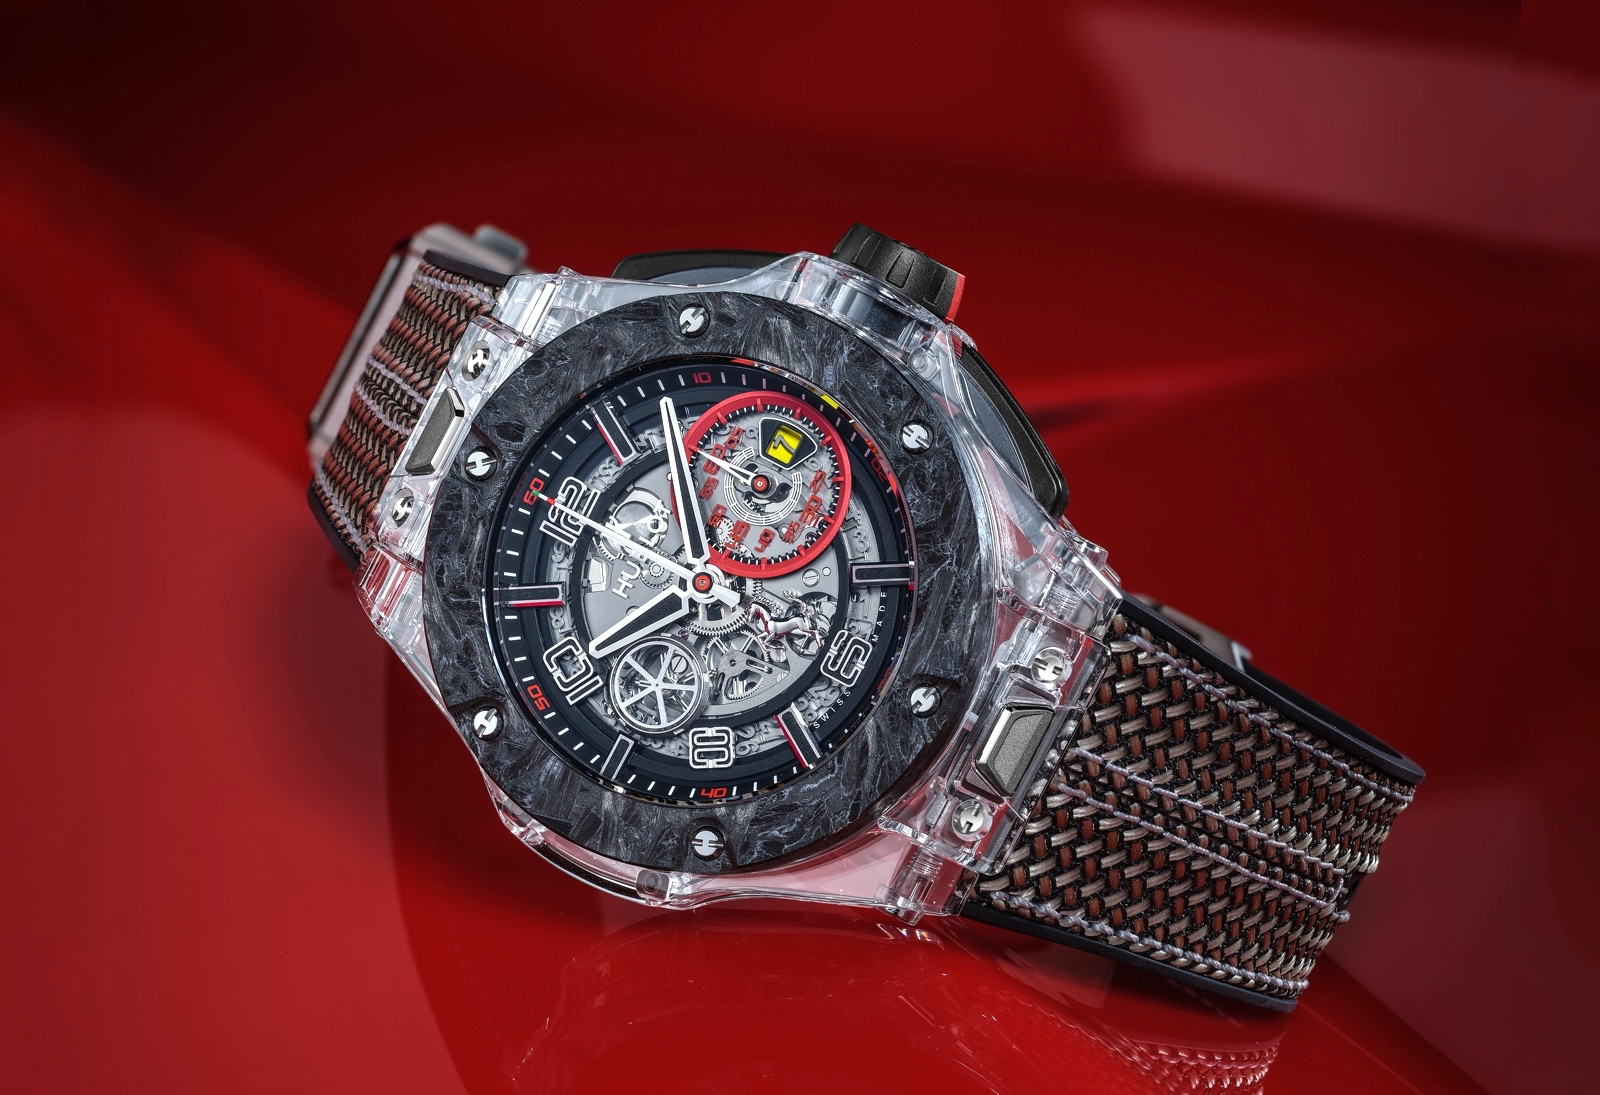 Hublot en Baselworld 2019 - Big Bang Scuderia Ferrari 90th Anniversary saphire